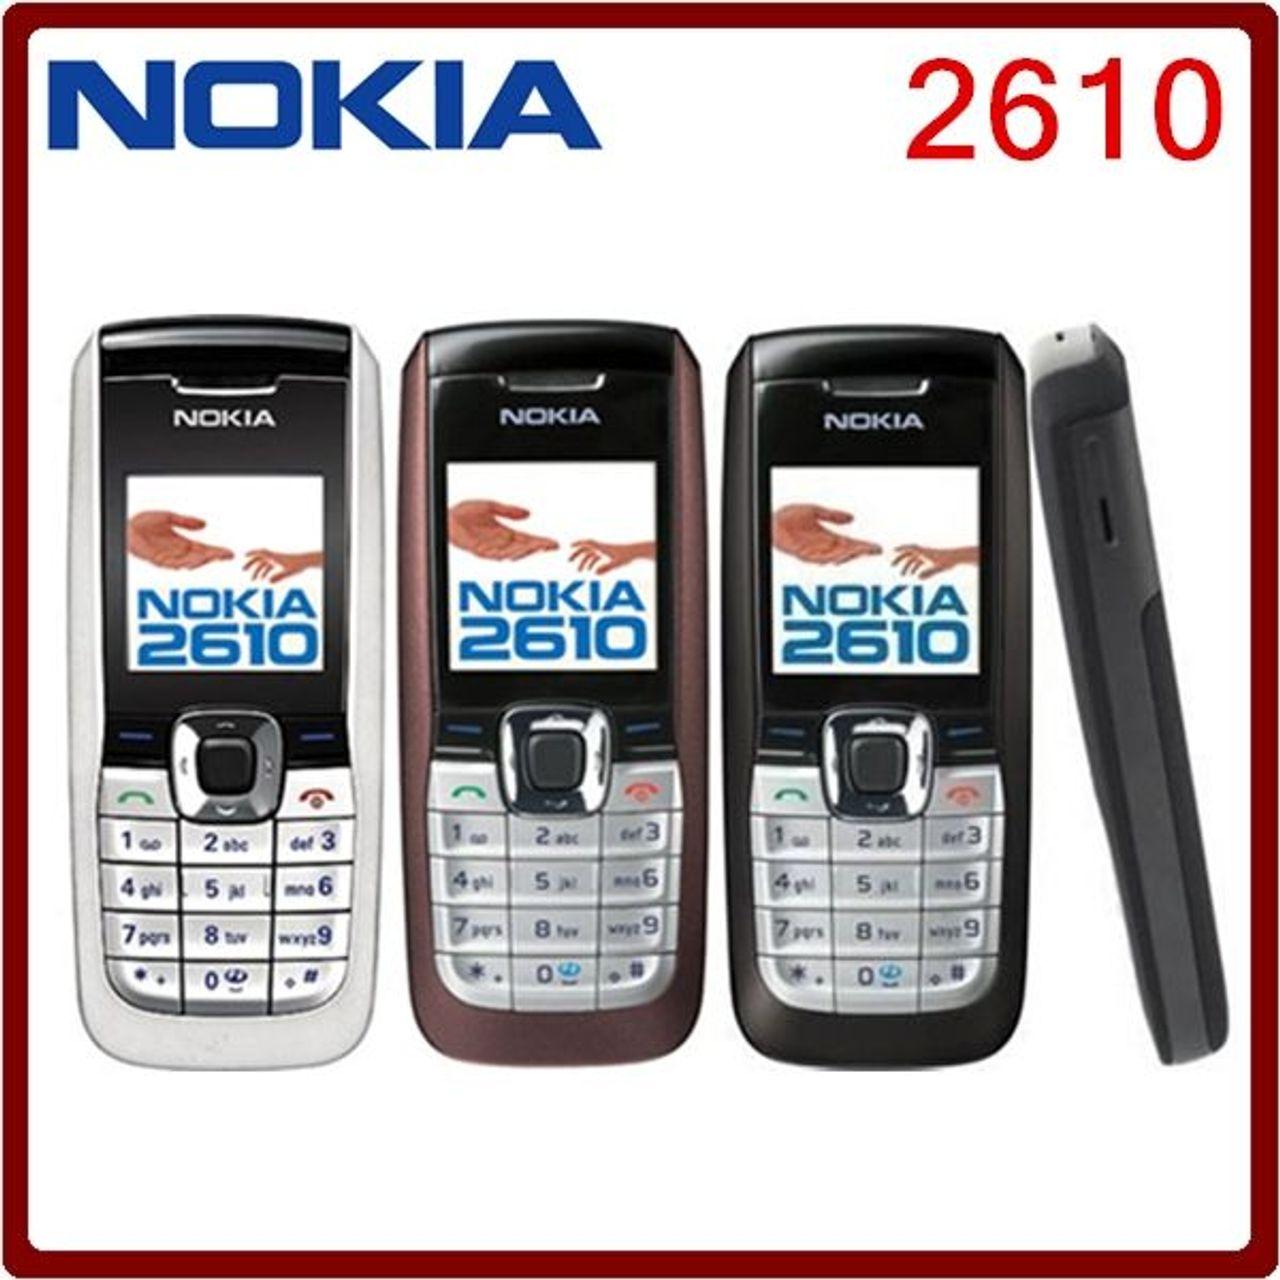 Nokia 2610 giá sỉ , giá bán buôn